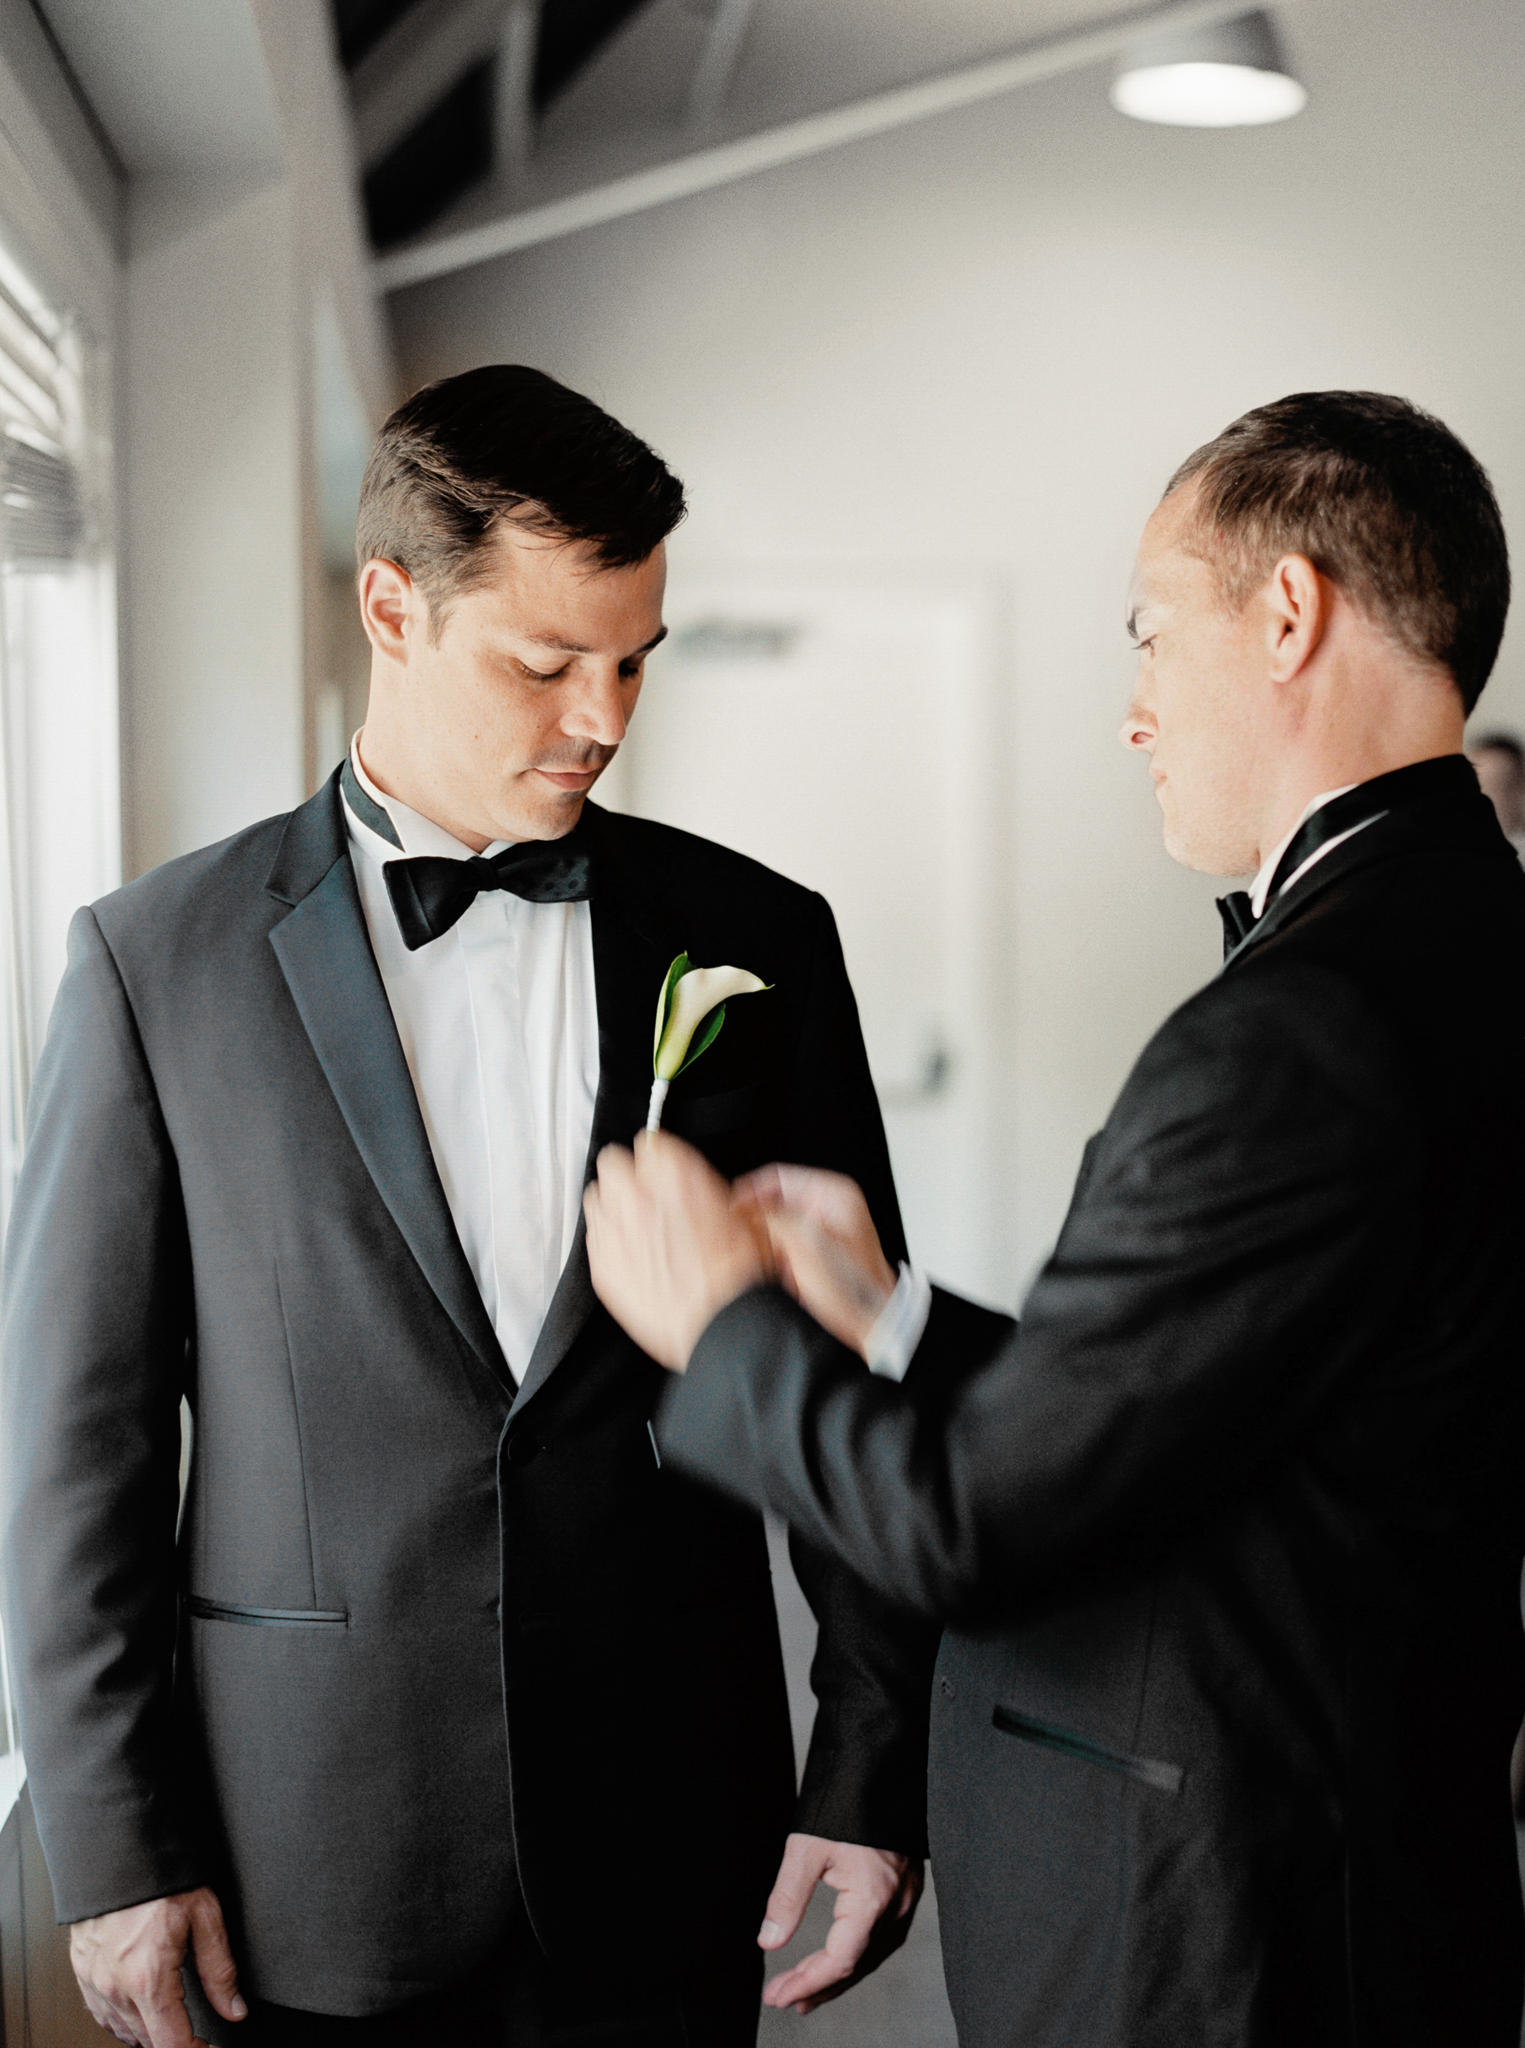 055OutliveCreative_Travel_Photographer_Videographer_Lewis&Clark_Oregon_Elegant_BlackTie_Destination_Wedding.jpg